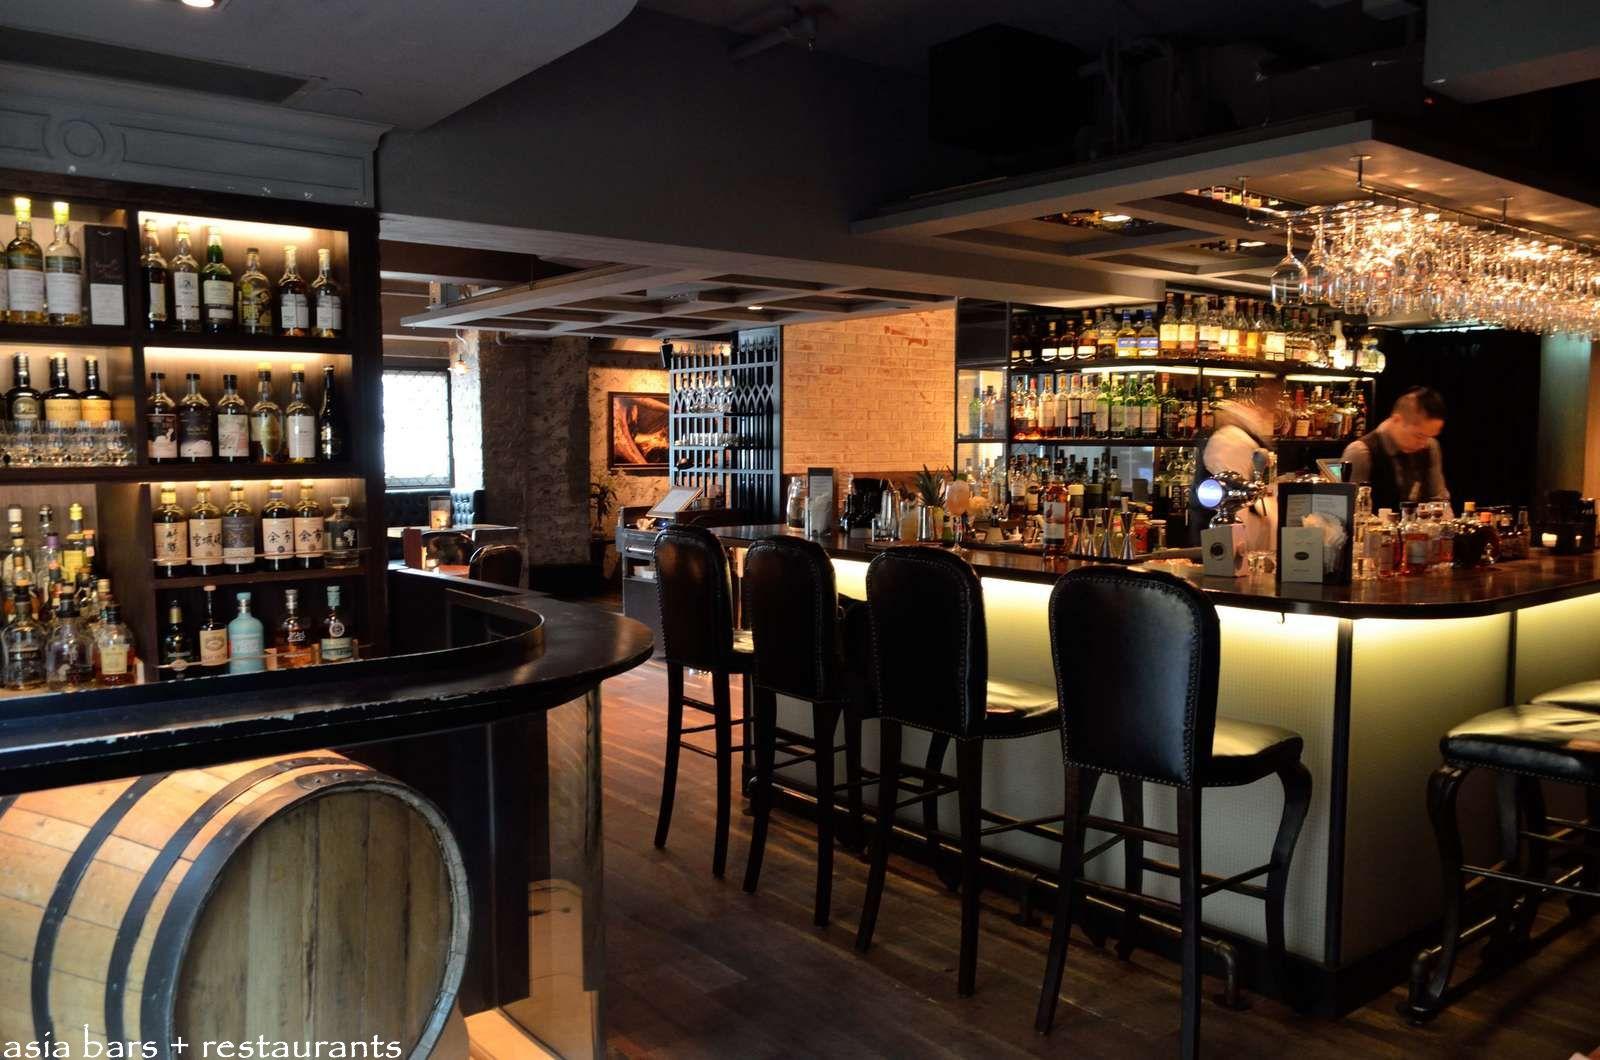 angel s share whisky bar restaurant in hong kong asia bars restaurants. Black Bedroom Furniture Sets. Home Design Ideas